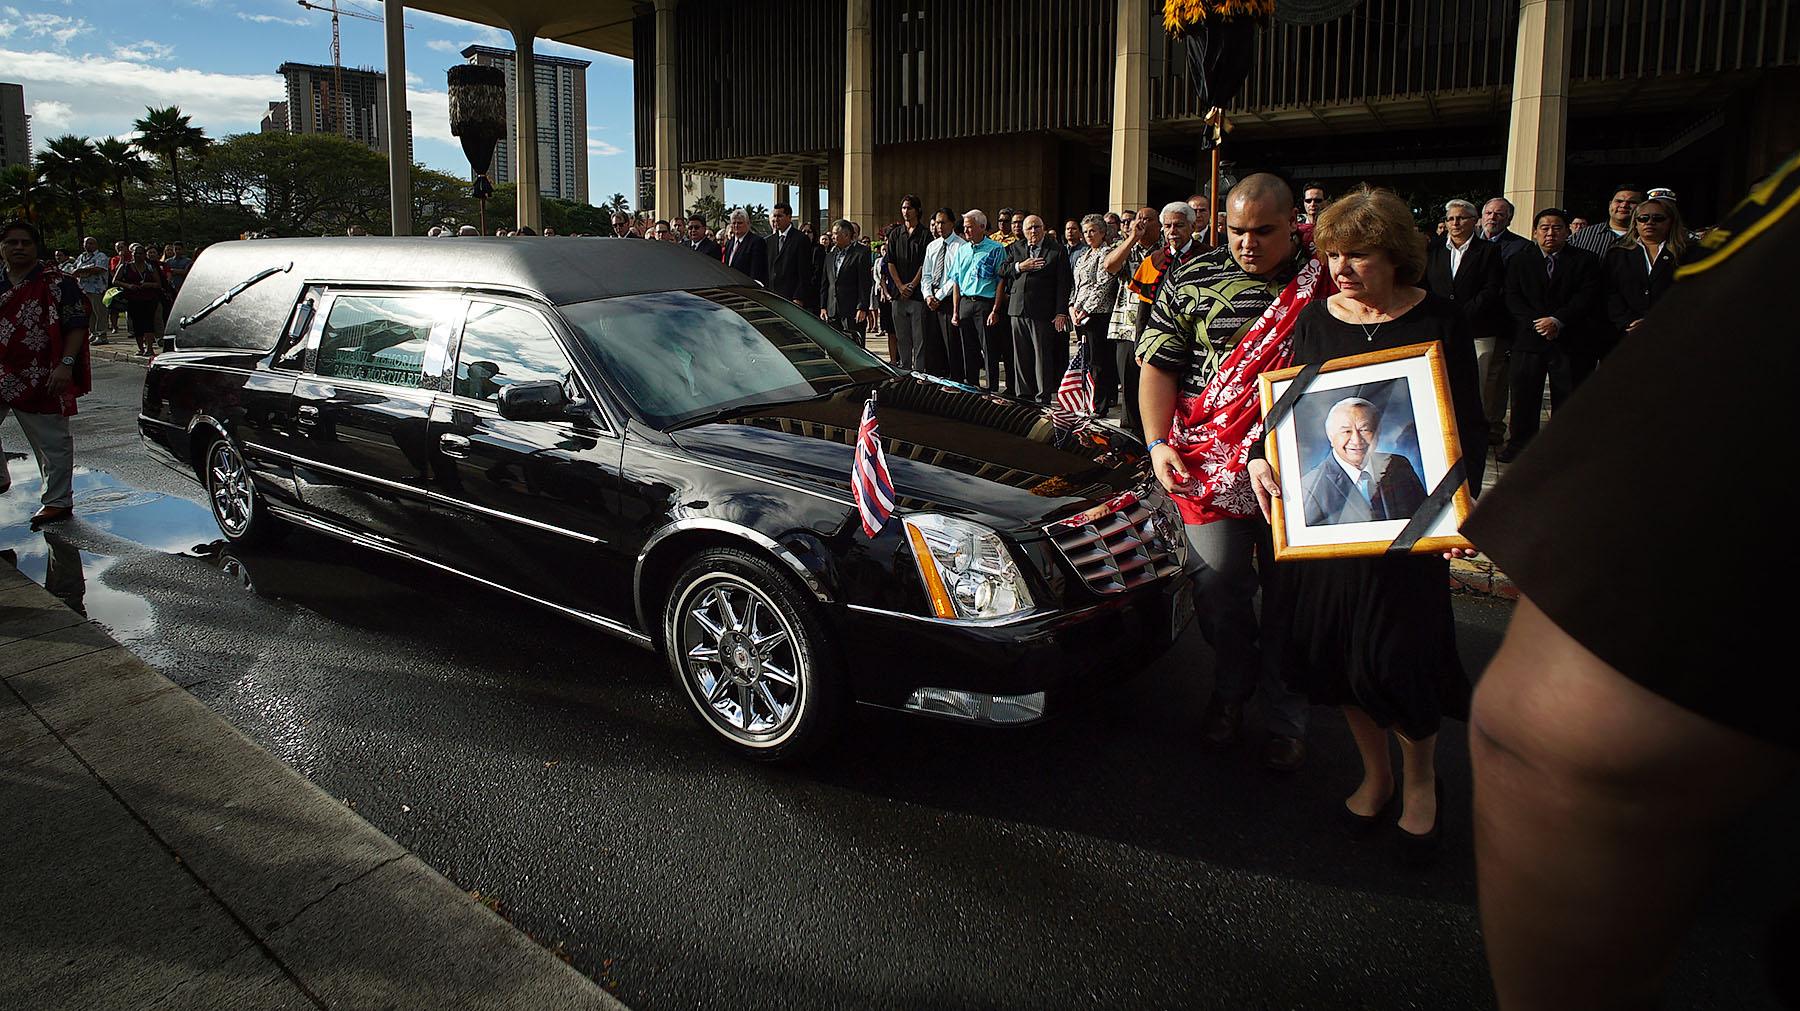 <p>Feb. 2: The late Sen. Gil Kahele's wife, Linda, watches as a hearse carrying the body of the Big Island legislator reaches the Capitol. <em>Cory Lum/Civil Beat</em></p>